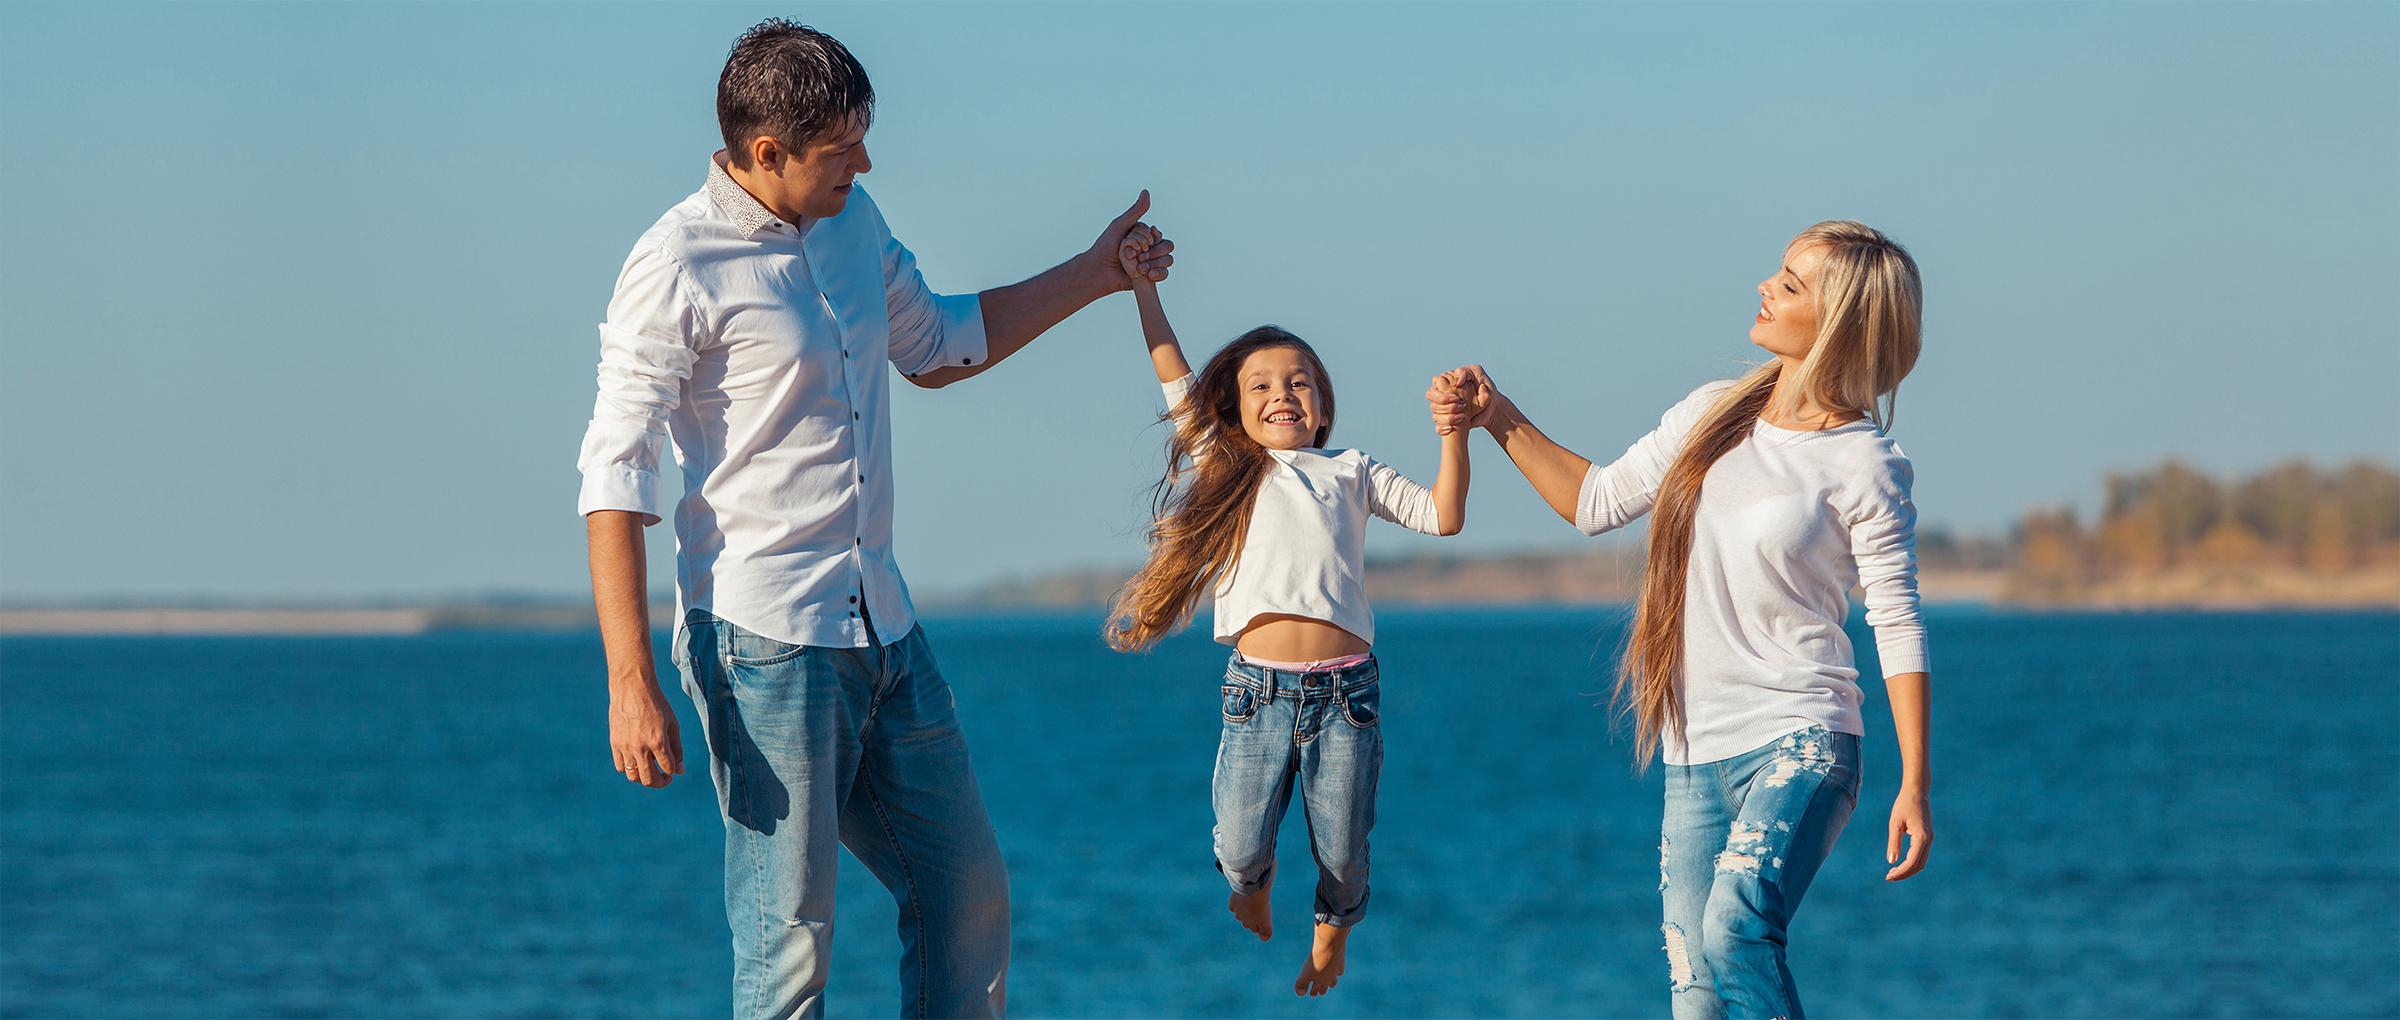 Compartir la paternidad sin ser pareja